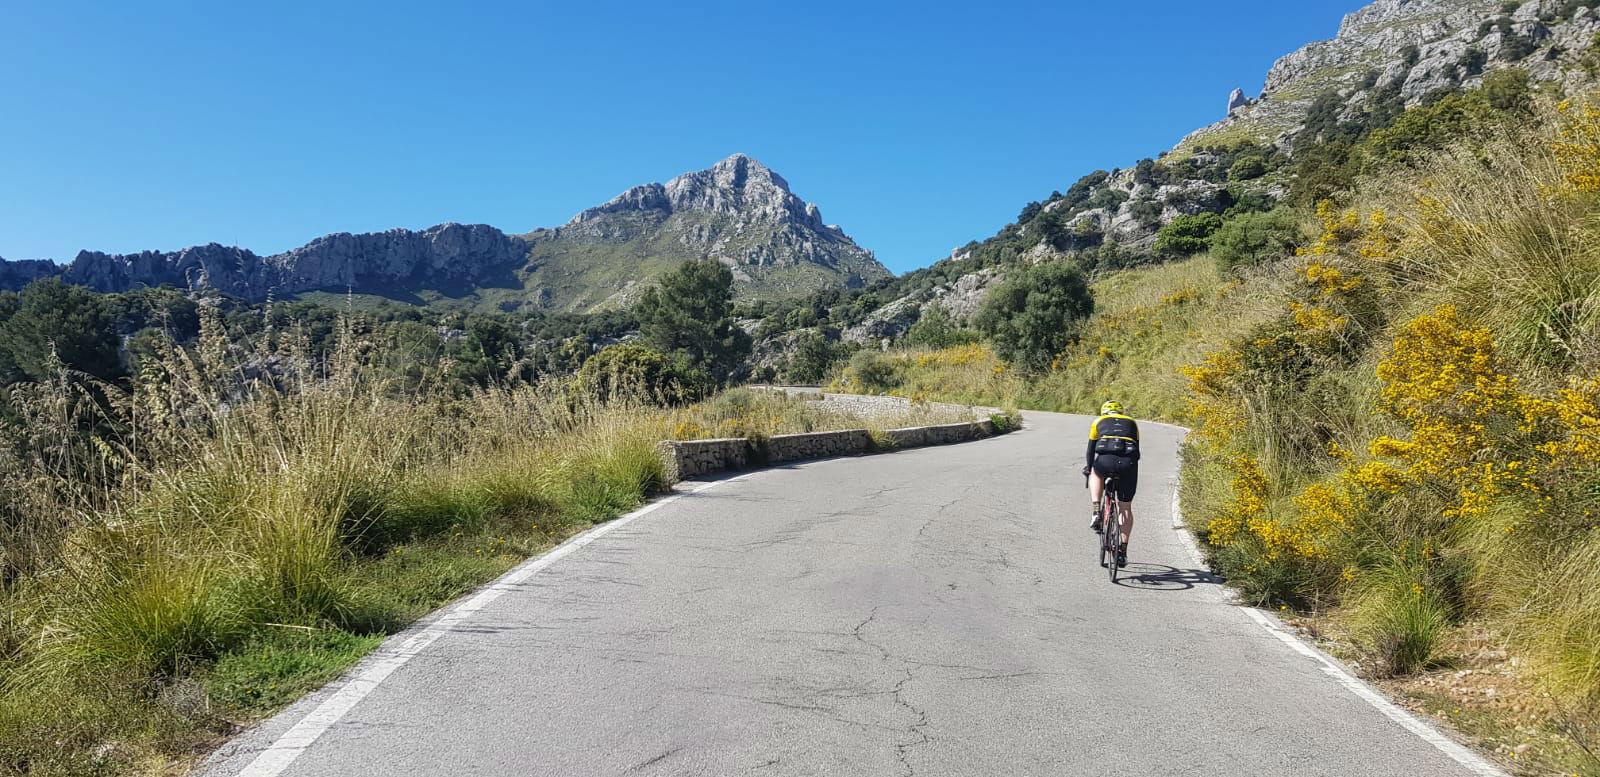 sa-caolbra-road-bike-route-72